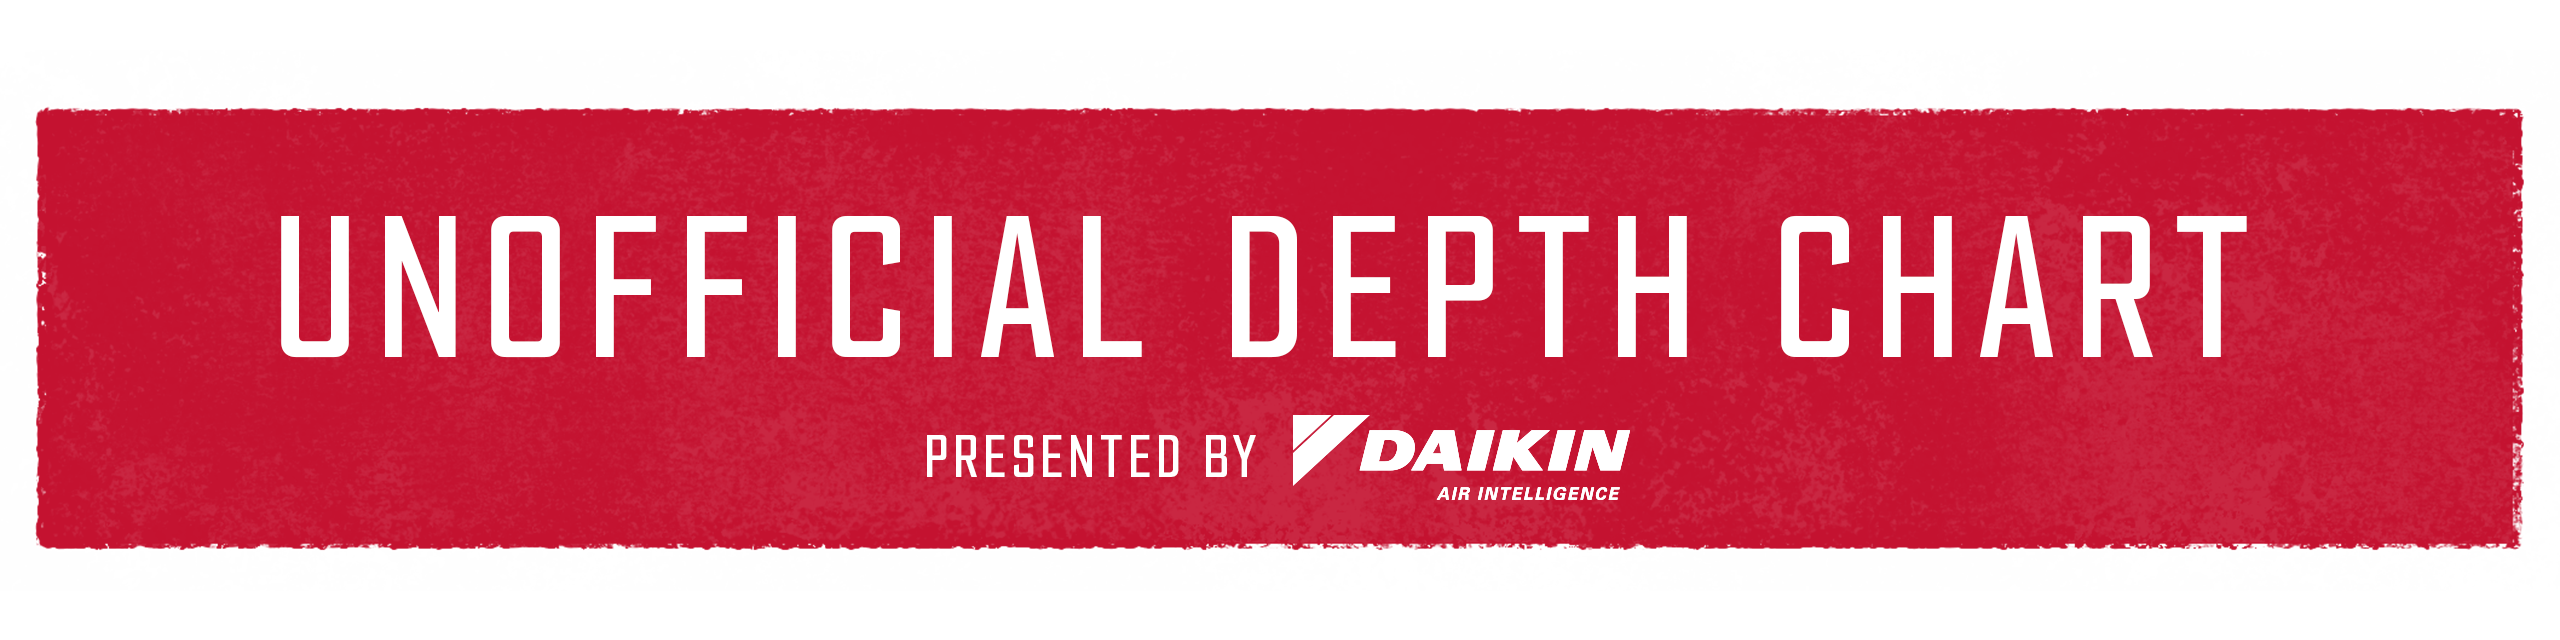 Unofficial Depth Chart presented by Daikin